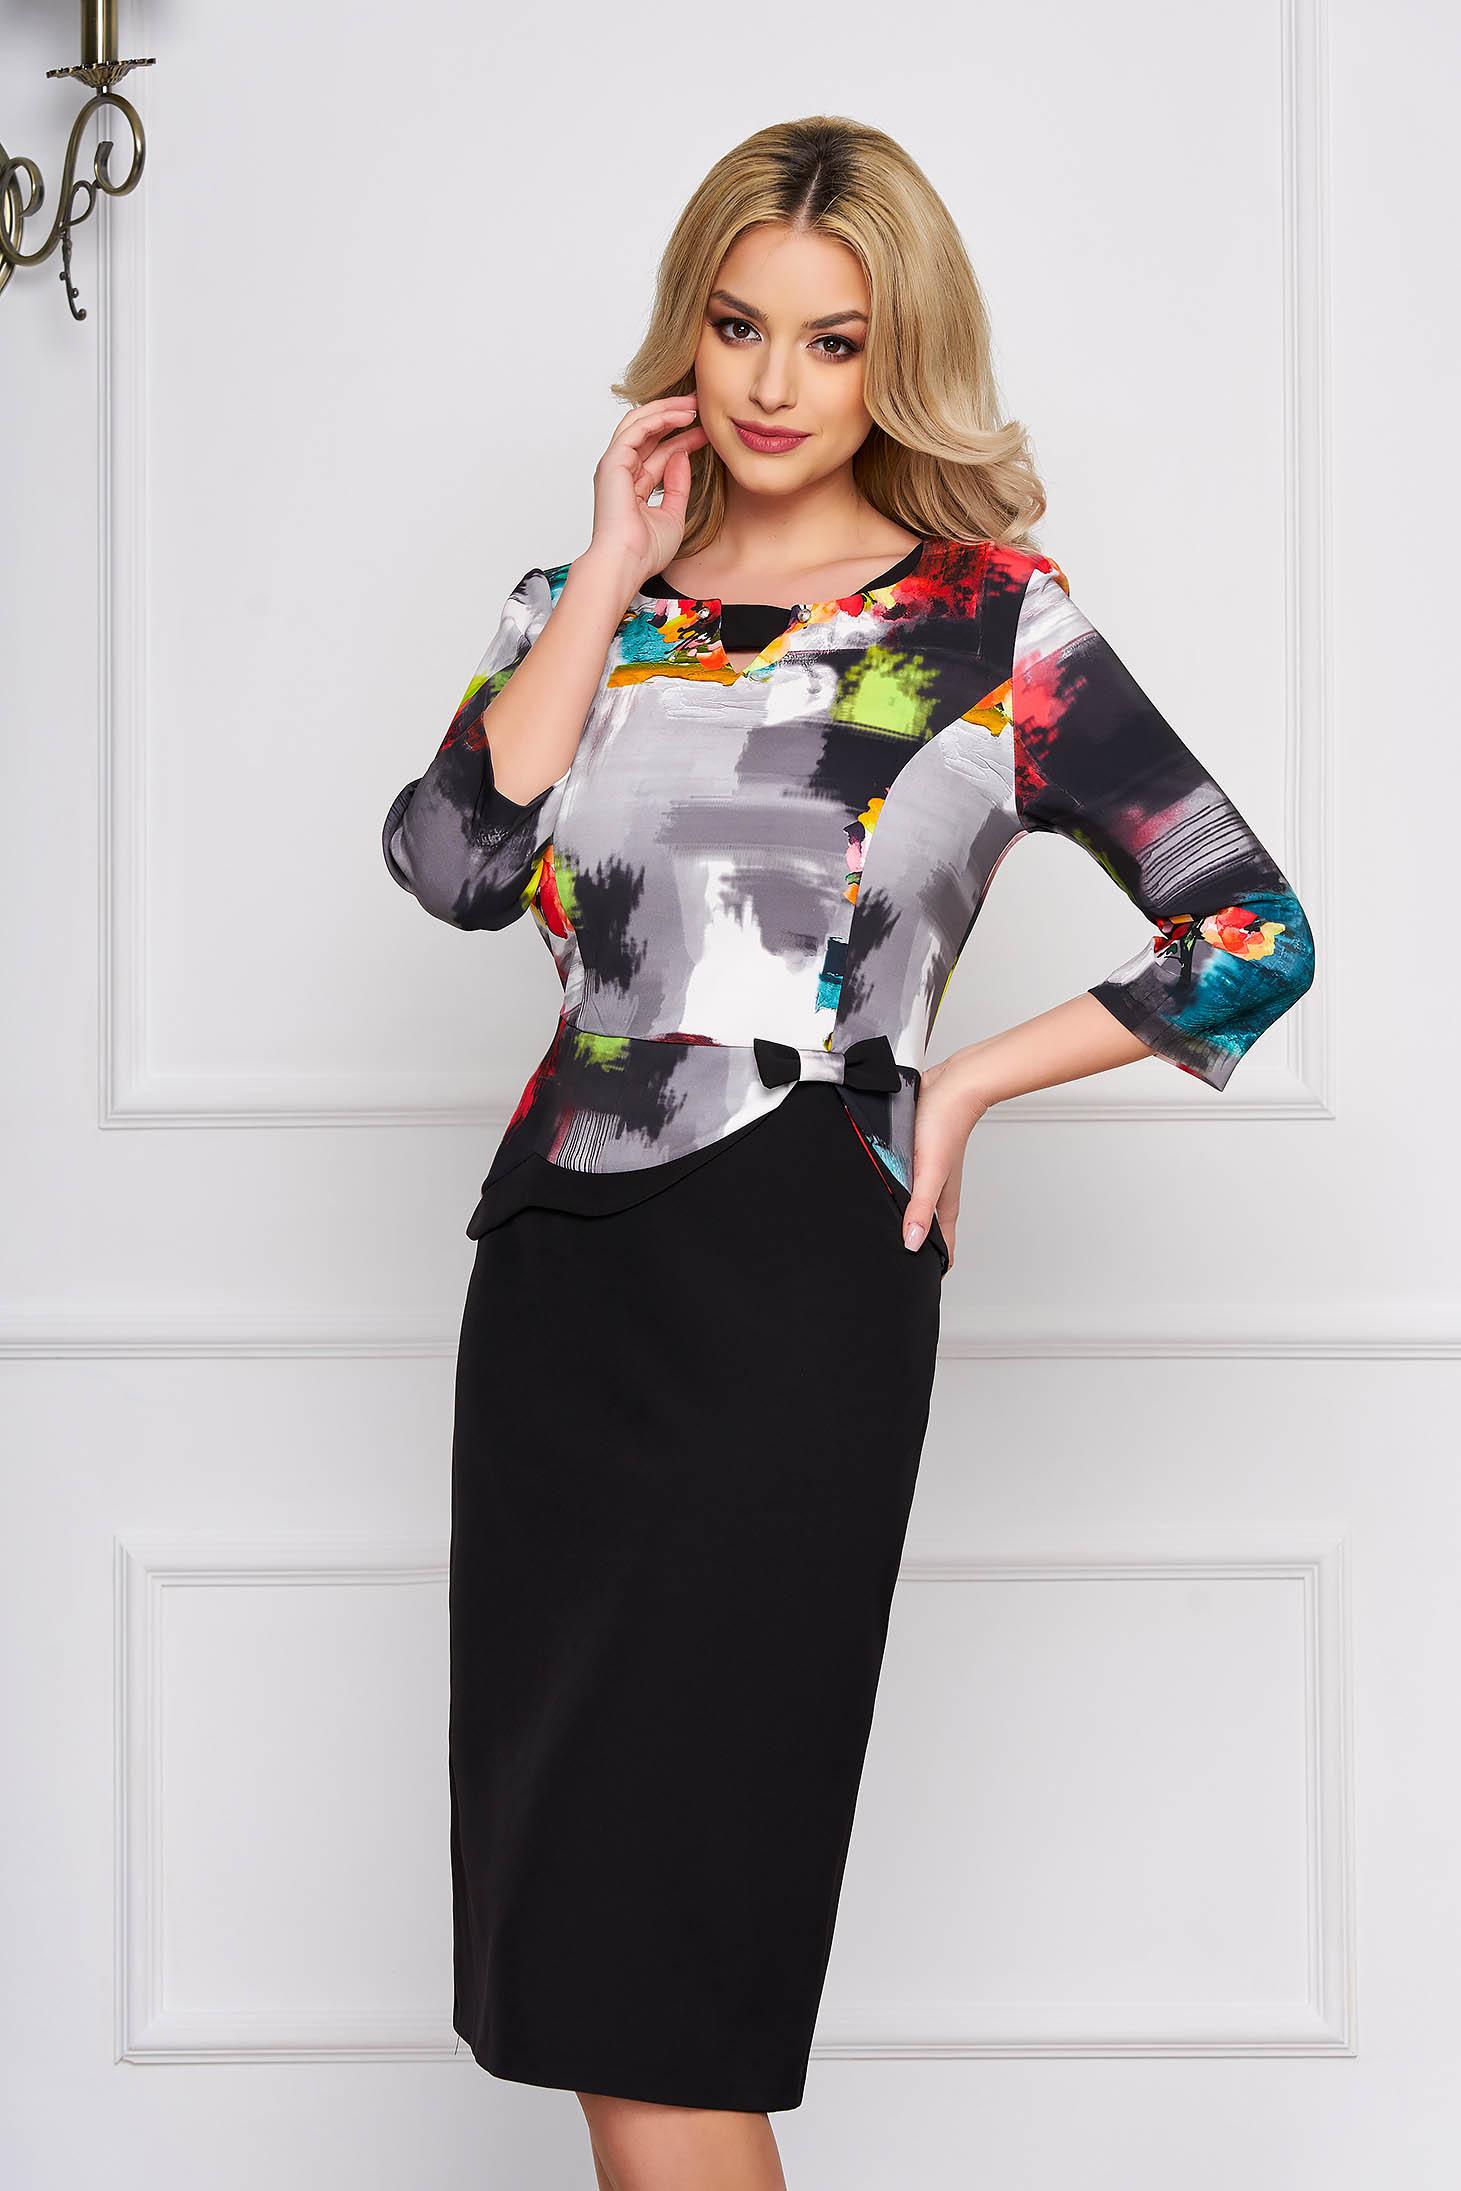 Grey dress with graphic print straight midi cloth elegant